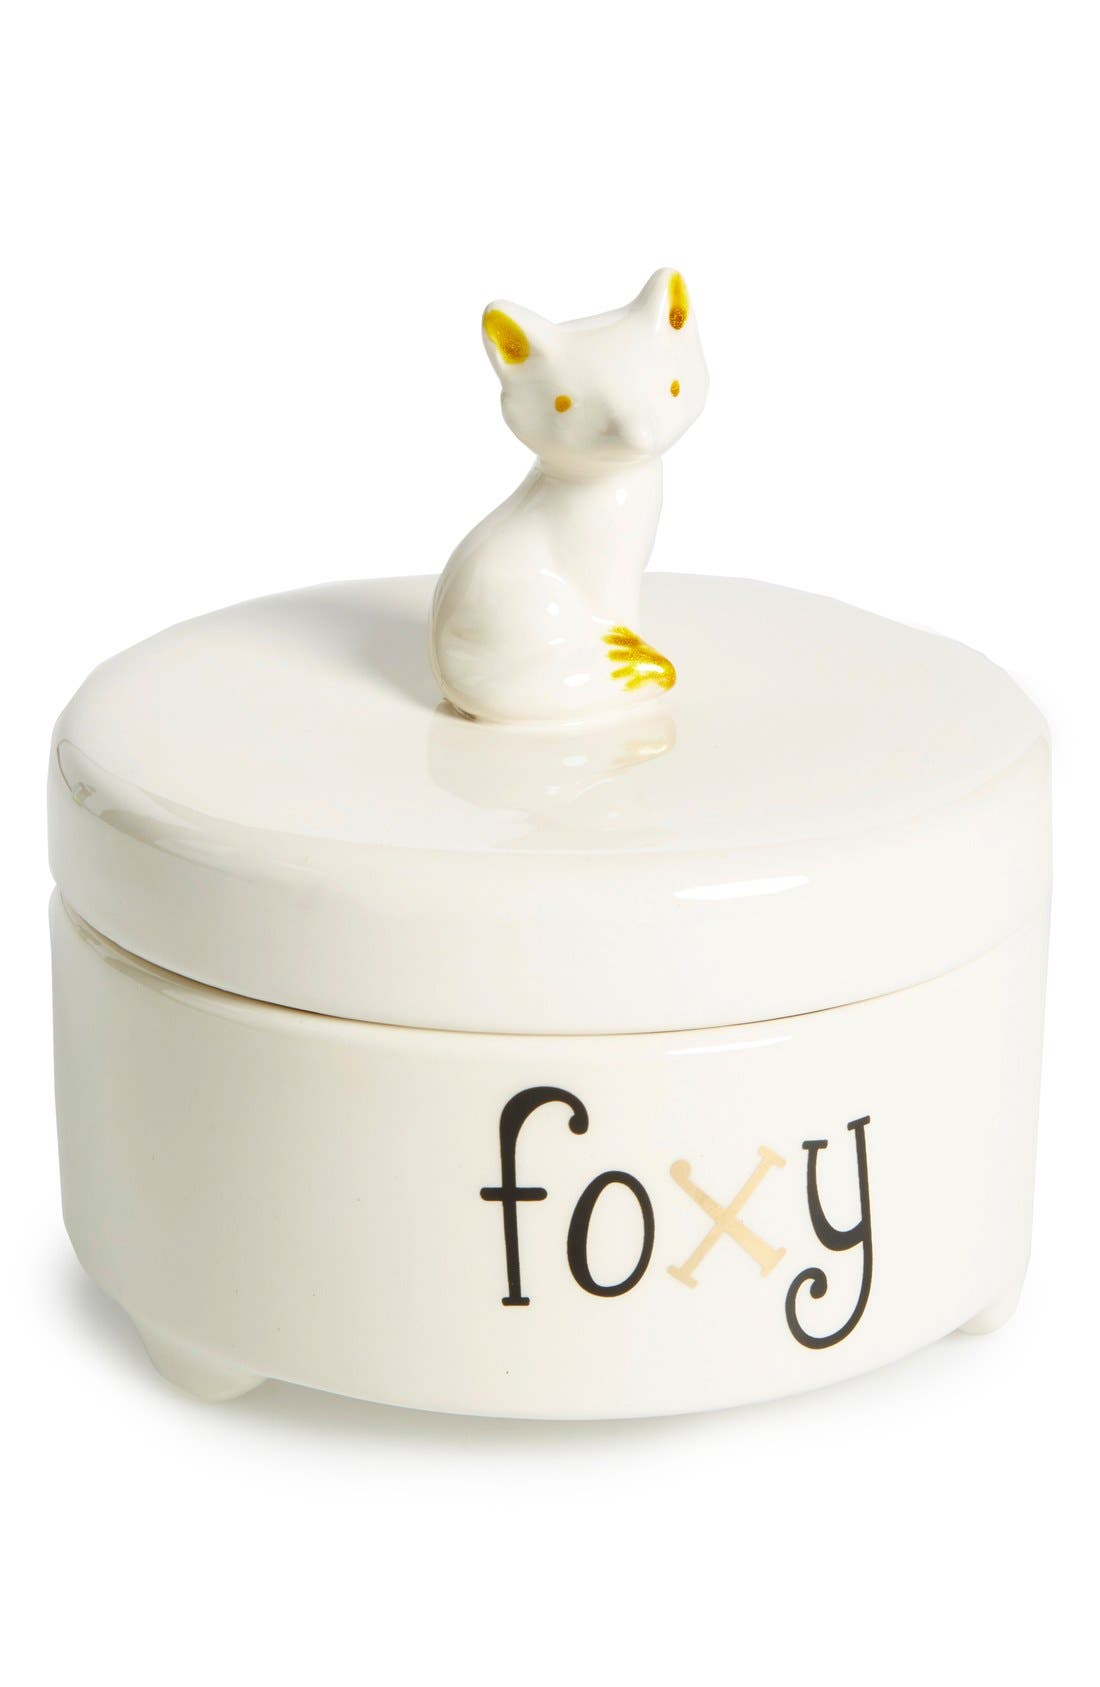 Alternate Image 1 Selected - American Atelier 'Foxy' Trinket Box